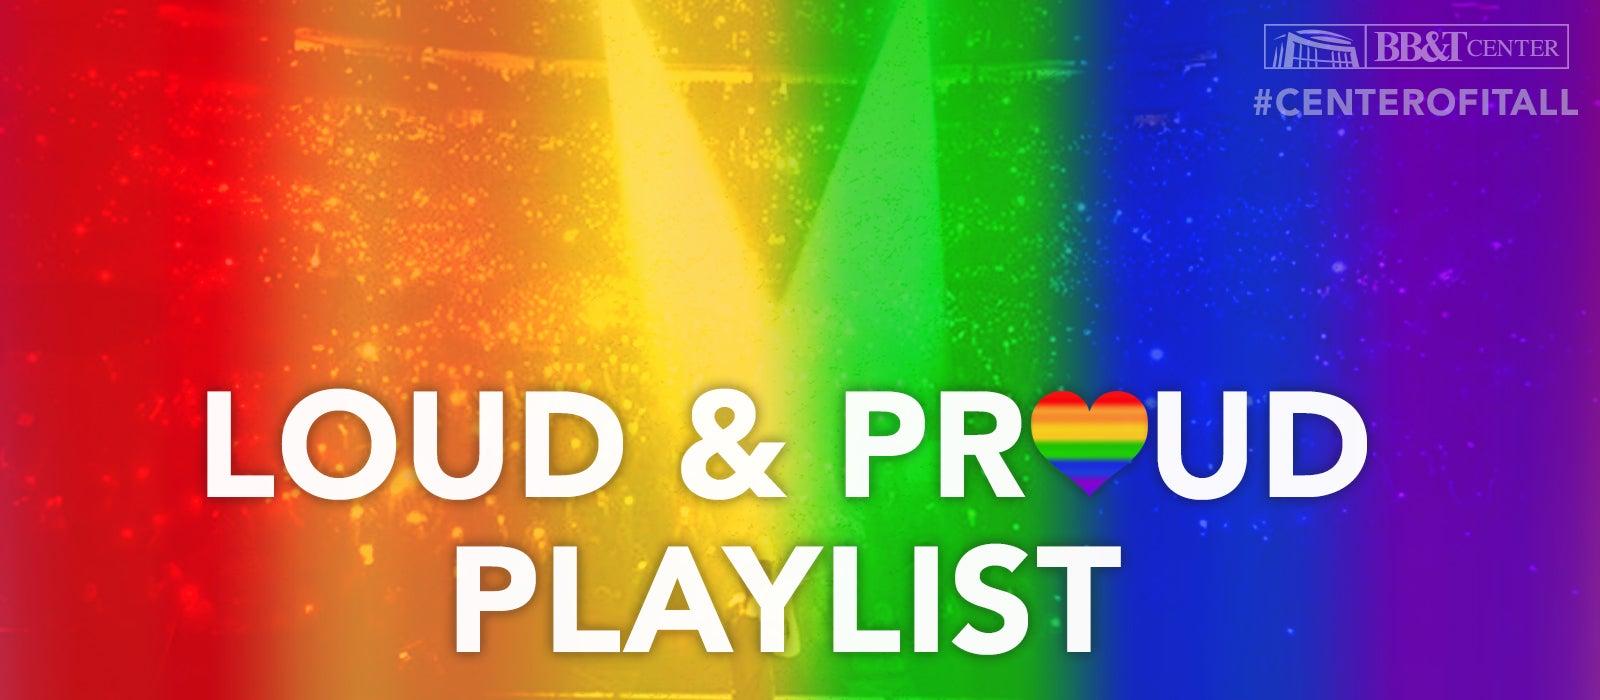 website prideplaylist 393bd4a5f7